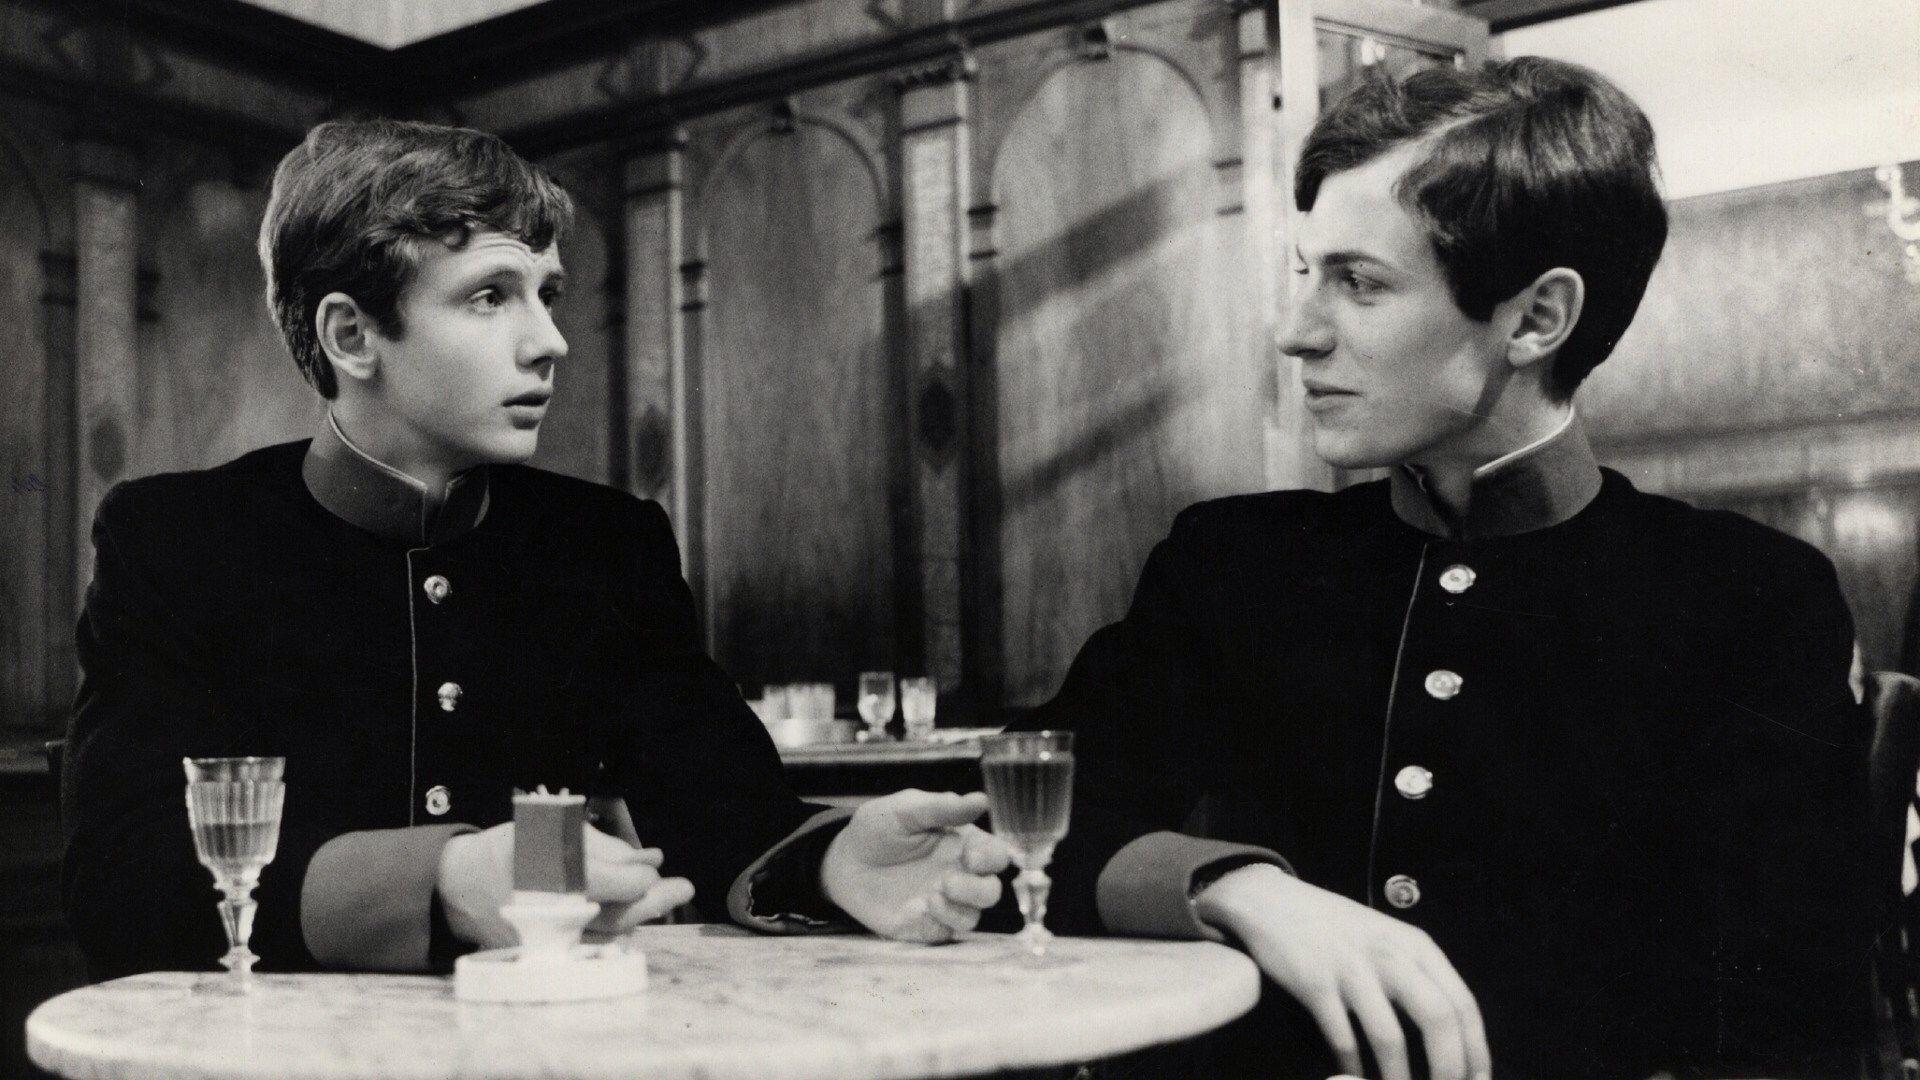 Mathieu Carriere And Bernd Tischer In Der Junge Torless By